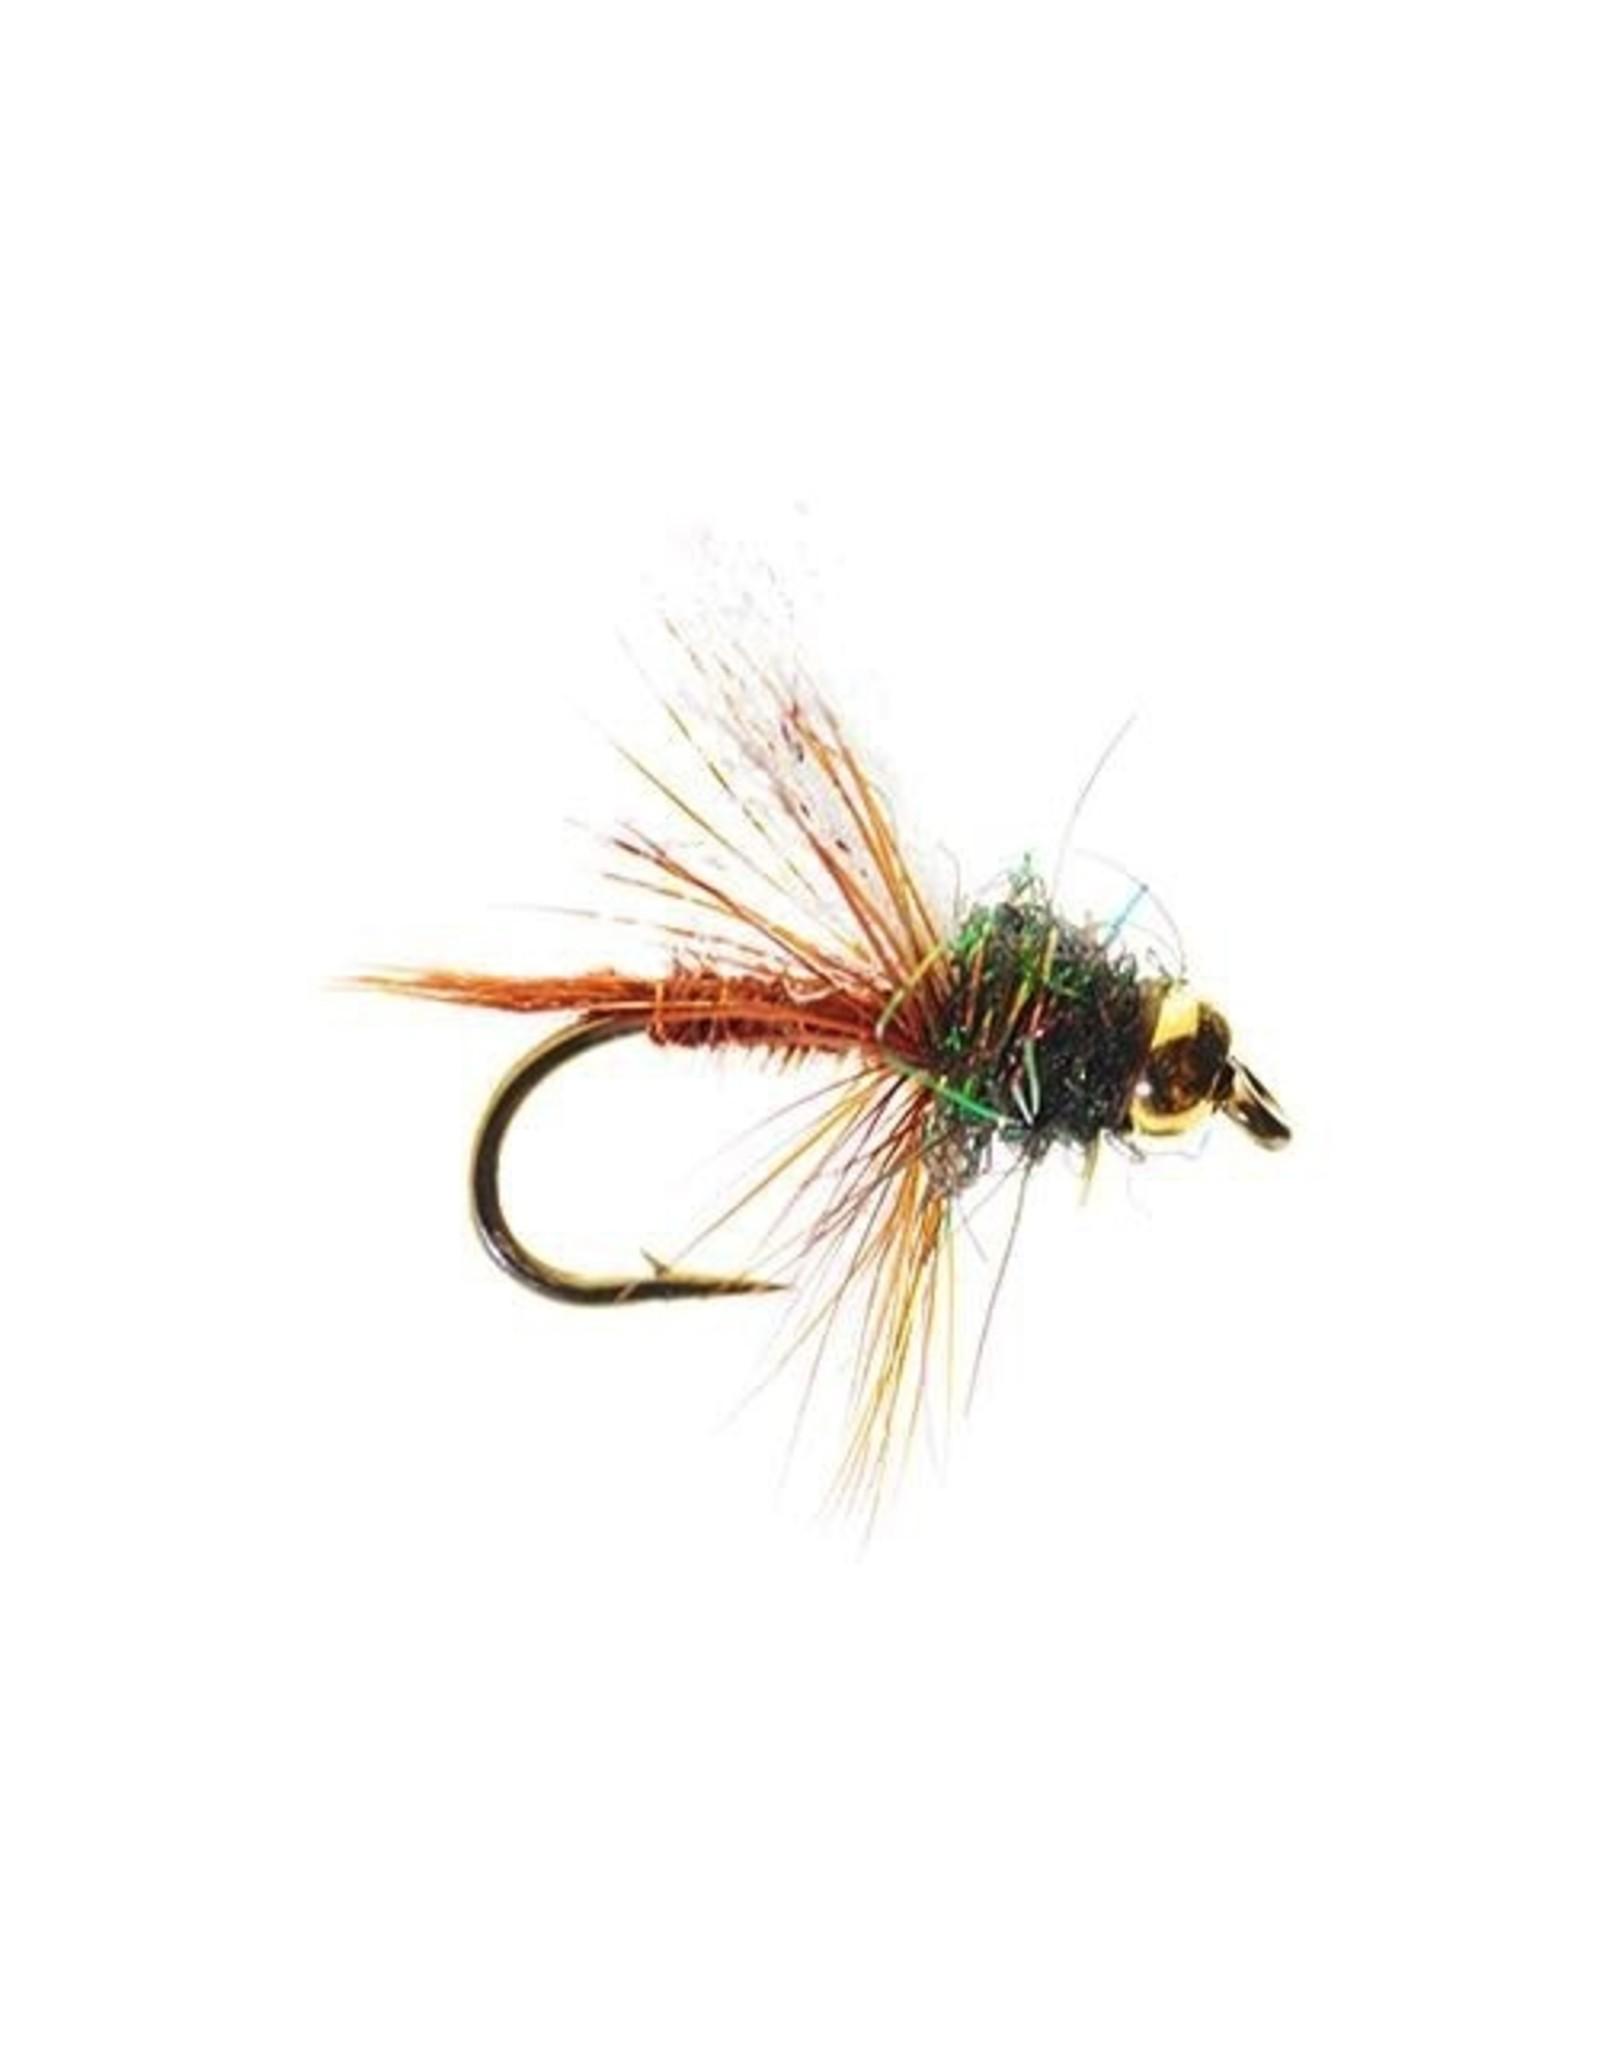 Umpqua Tak's Go To Pheasant Tail (3 Pack)